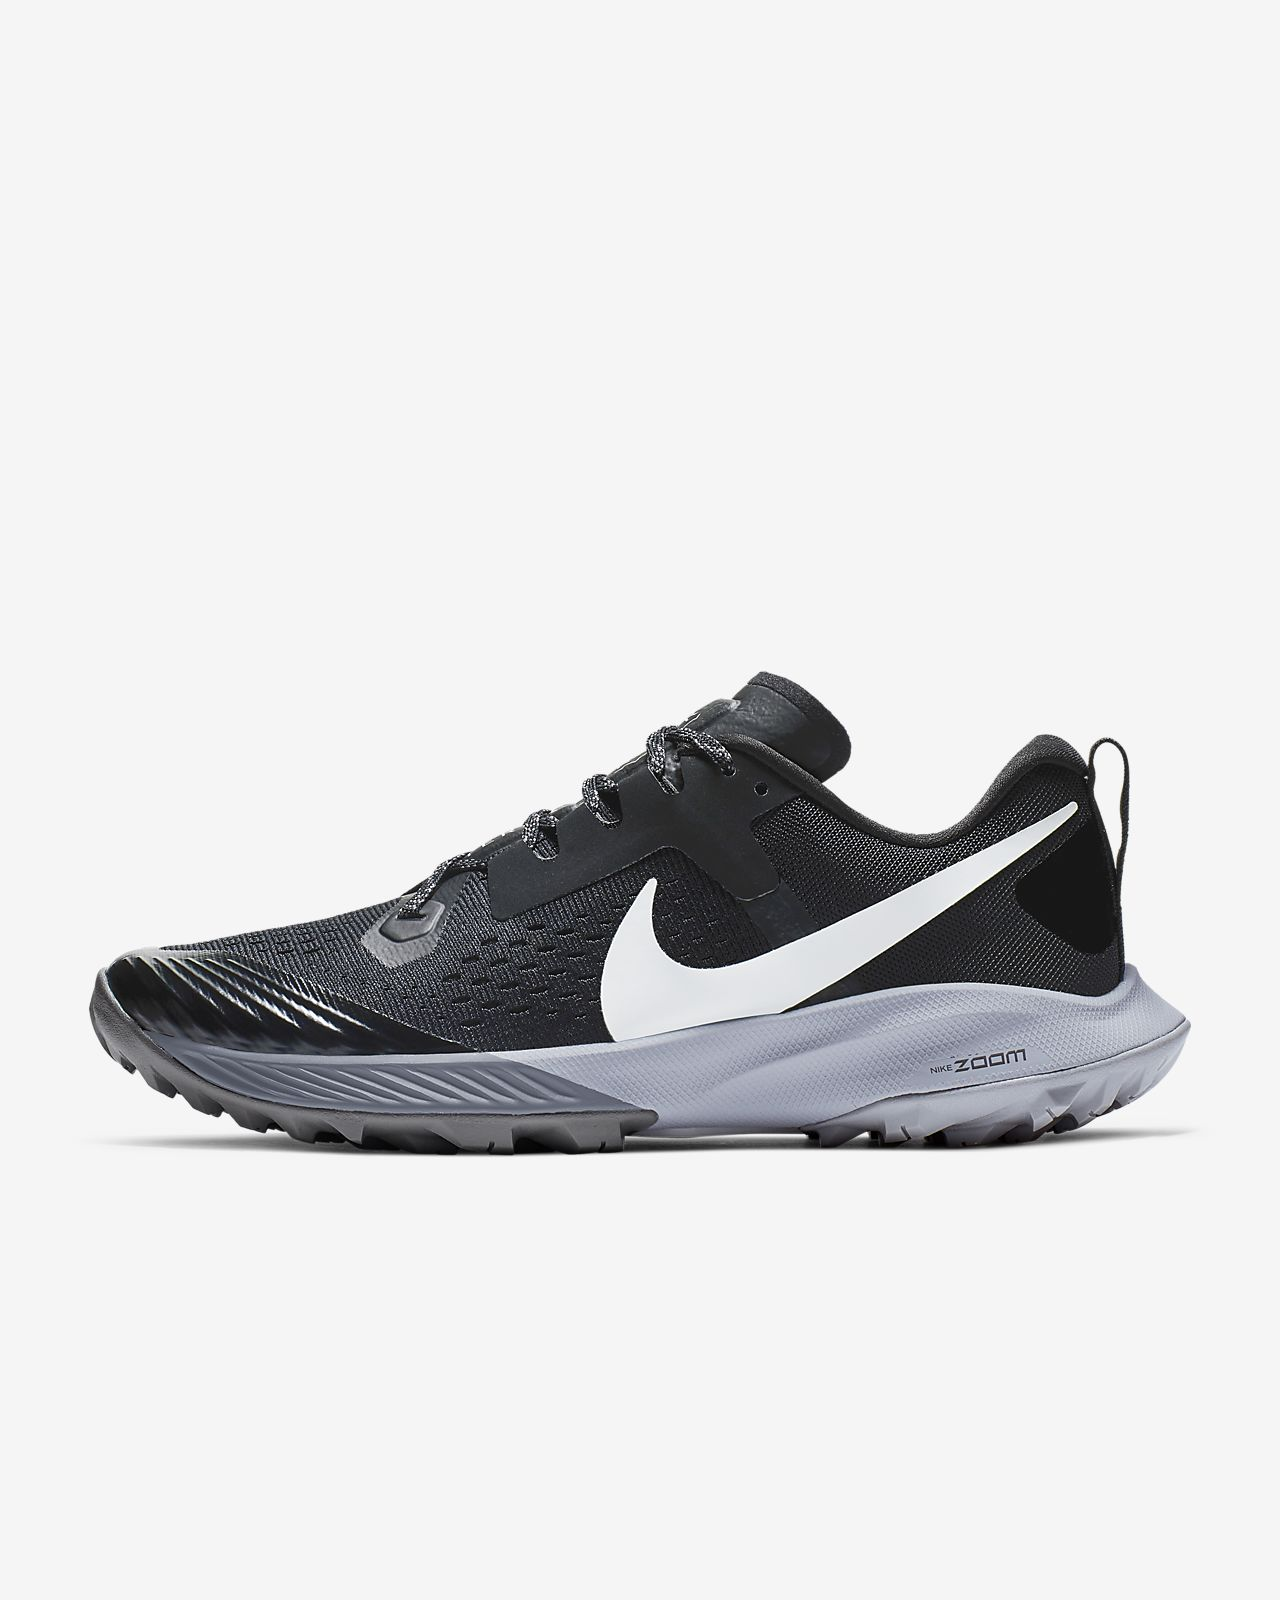 Sapatilhas de running Nike Air Zoom Terra Kiger 5 para mulher